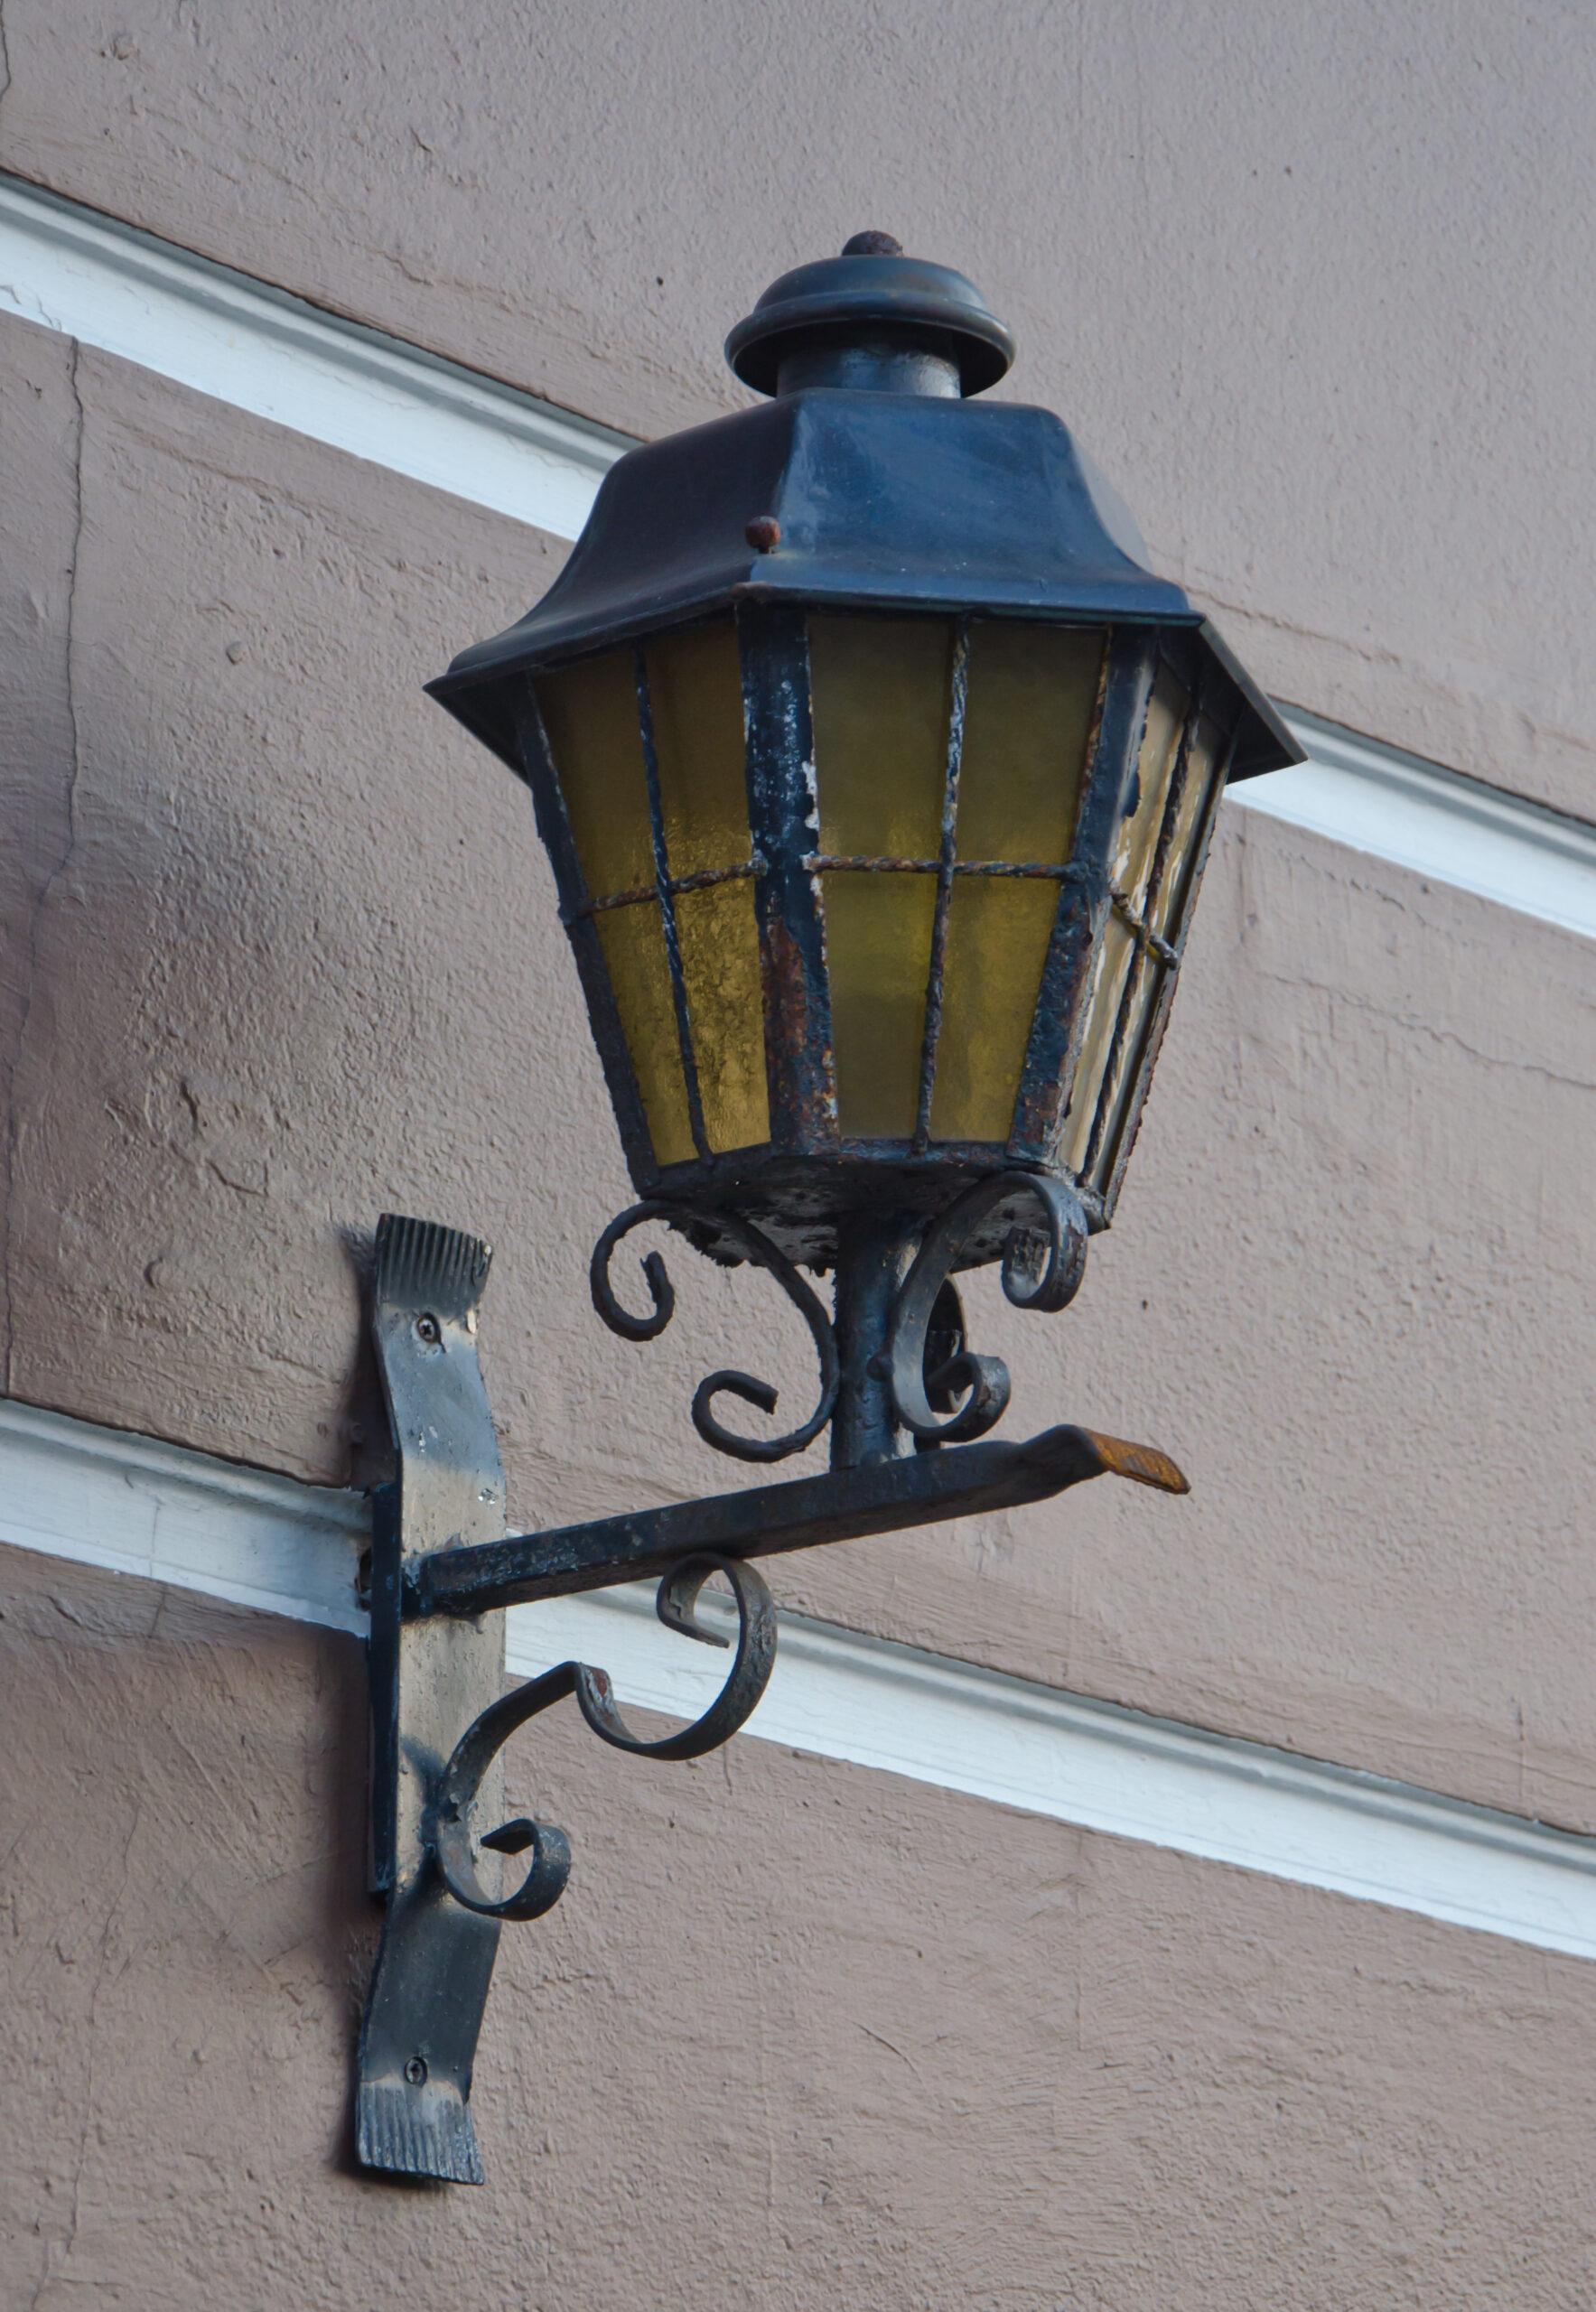 Full Size of Landhaus Lampen Filealt Rahlsteder Lampejpg Wikimedia Bad Led Regal Weiß Küche Boxspring Bett Landhausstil Fenster Deckenlampen Wohnzimmer Esstisch Sofa Wohnzimmer Landhaus Lampen